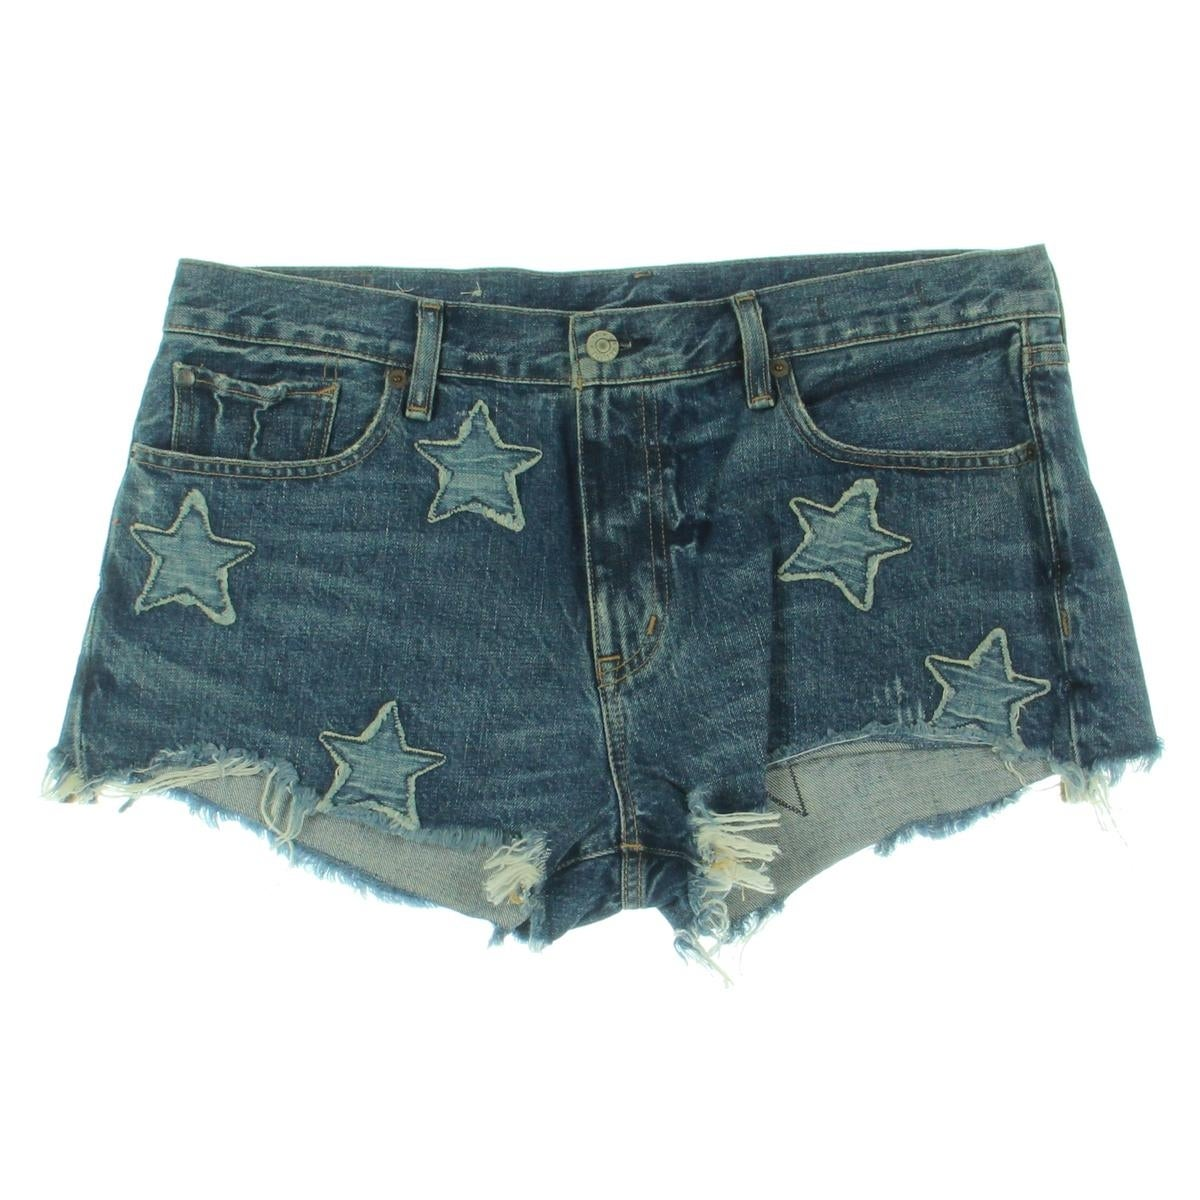 238557c86 Shop Denim   Supply Ralph Lauren Womens Shorts Boyfriend Star Patchwork -  Free Shipping On Orders Over  45 - Overstock - 20908333